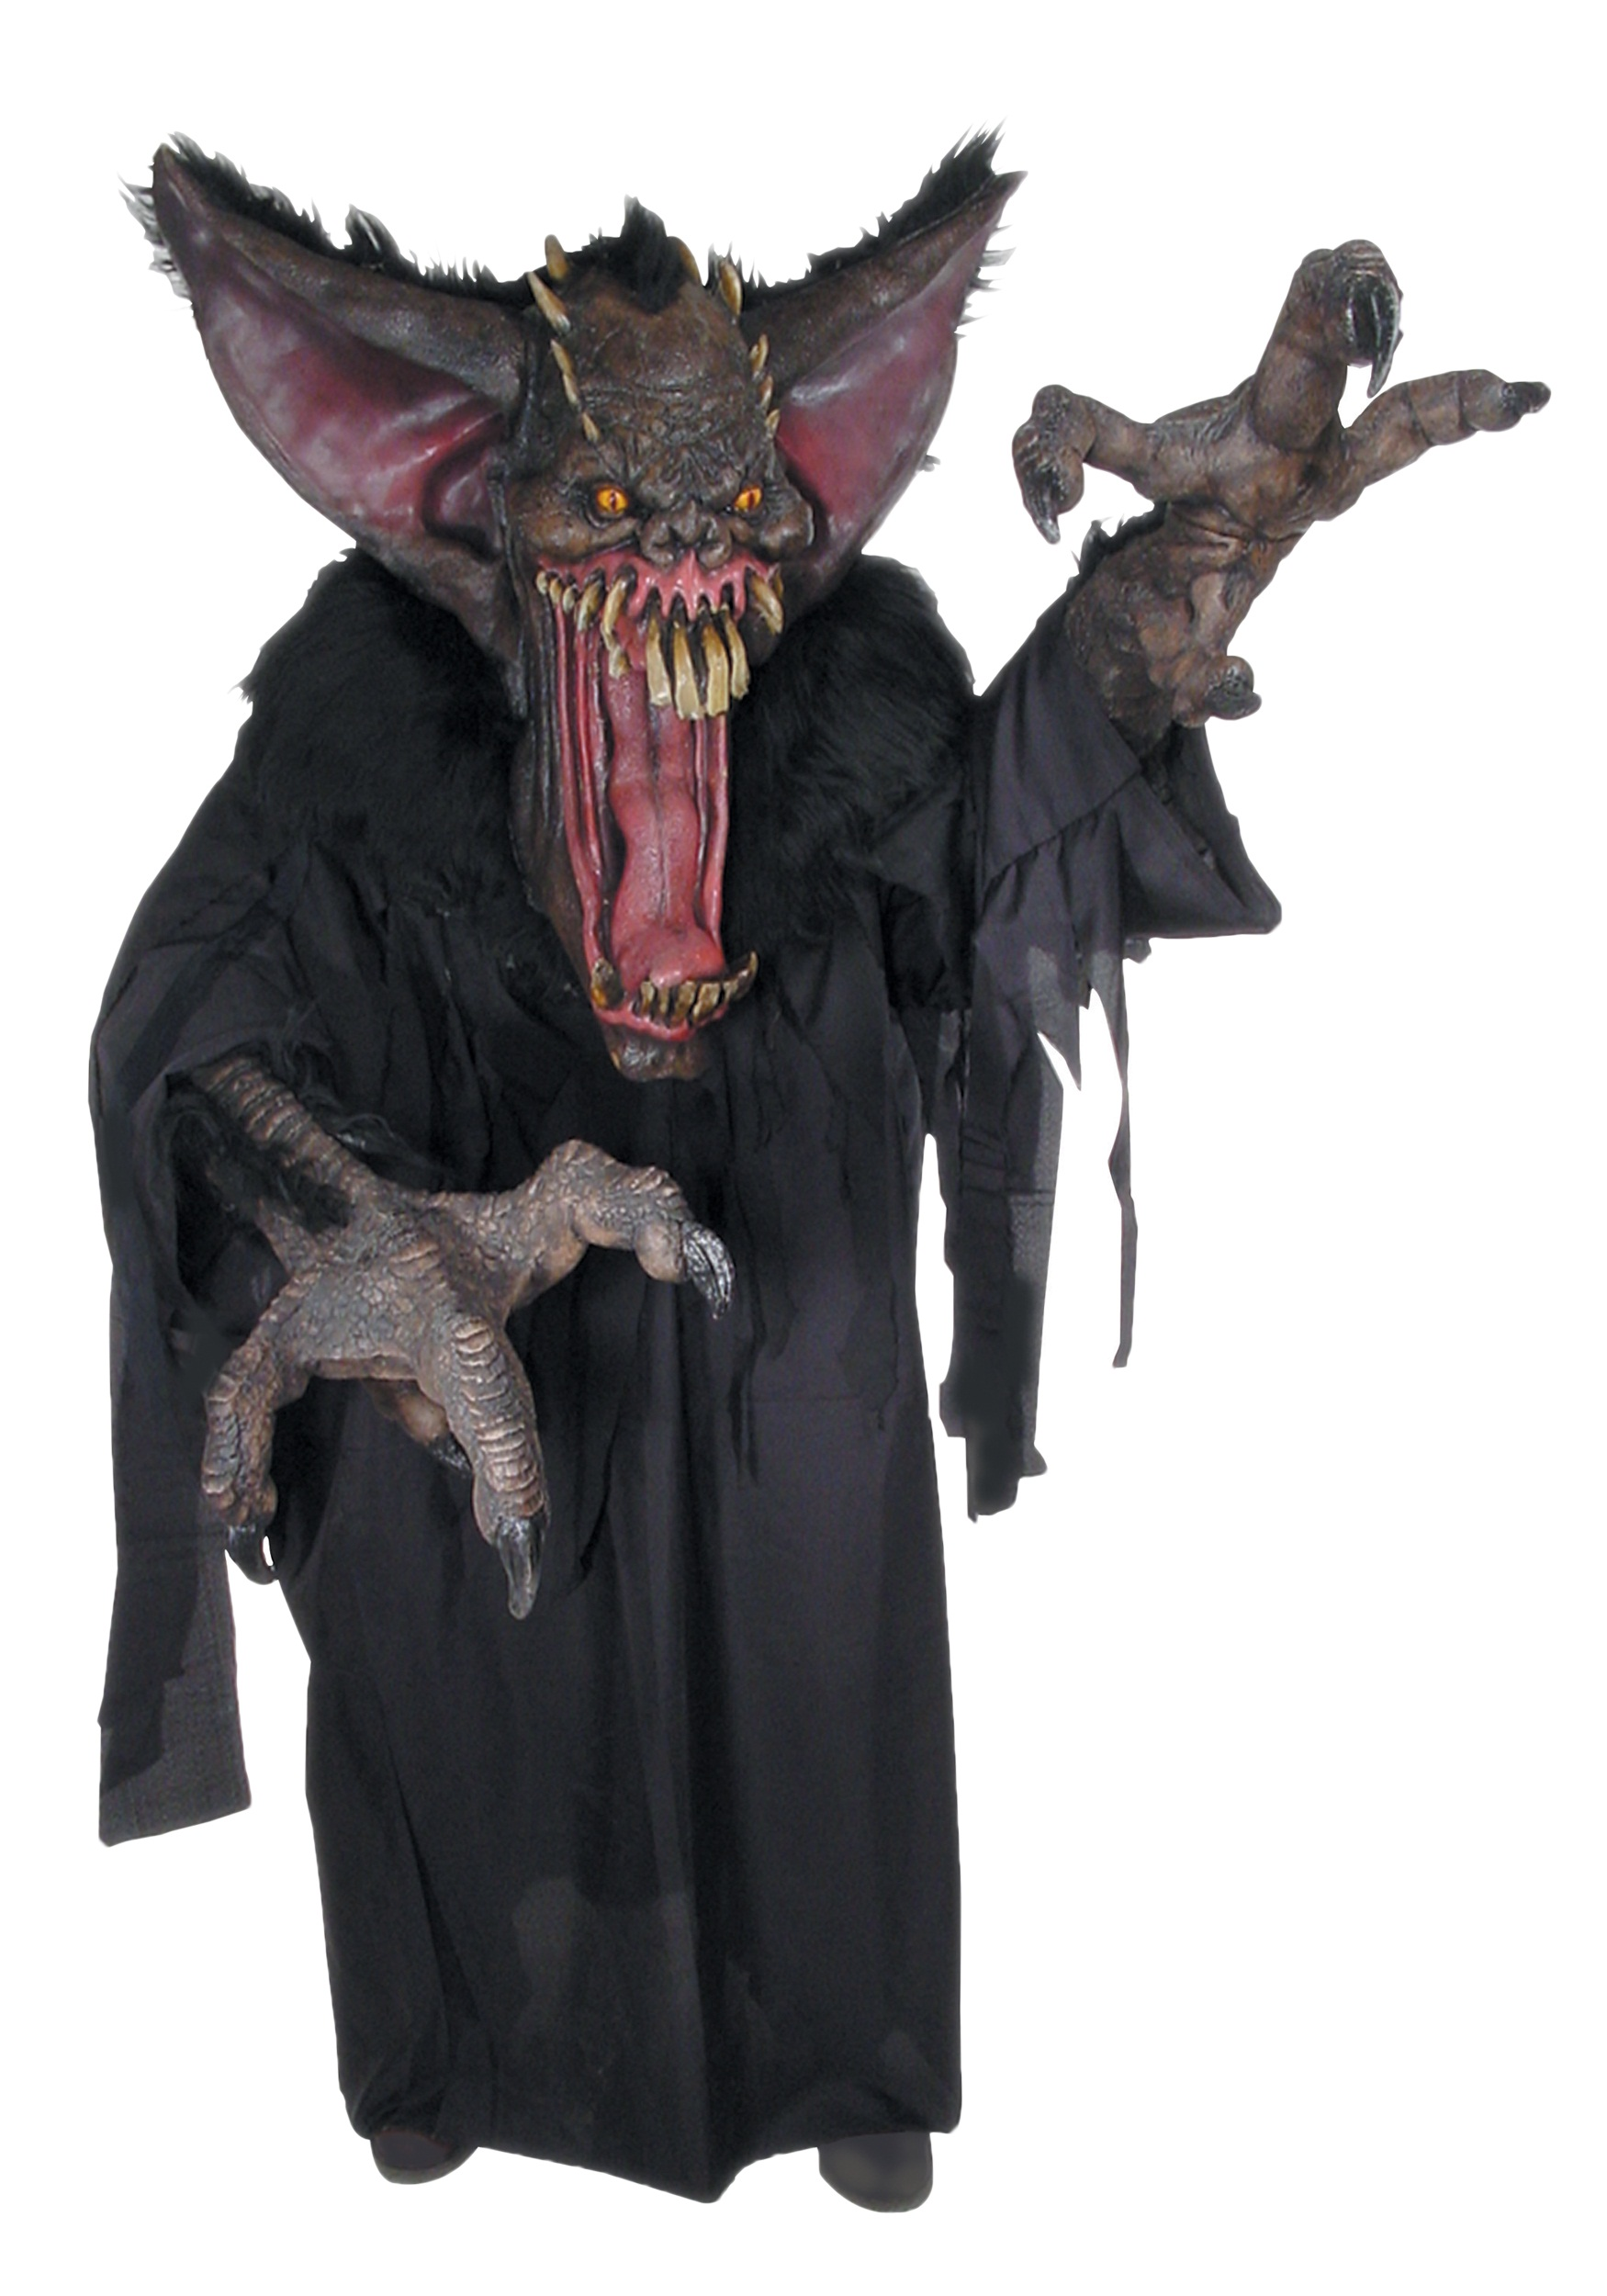 Expensive Masks For Halloween.Gruesome Bat Creature Reacher Costume